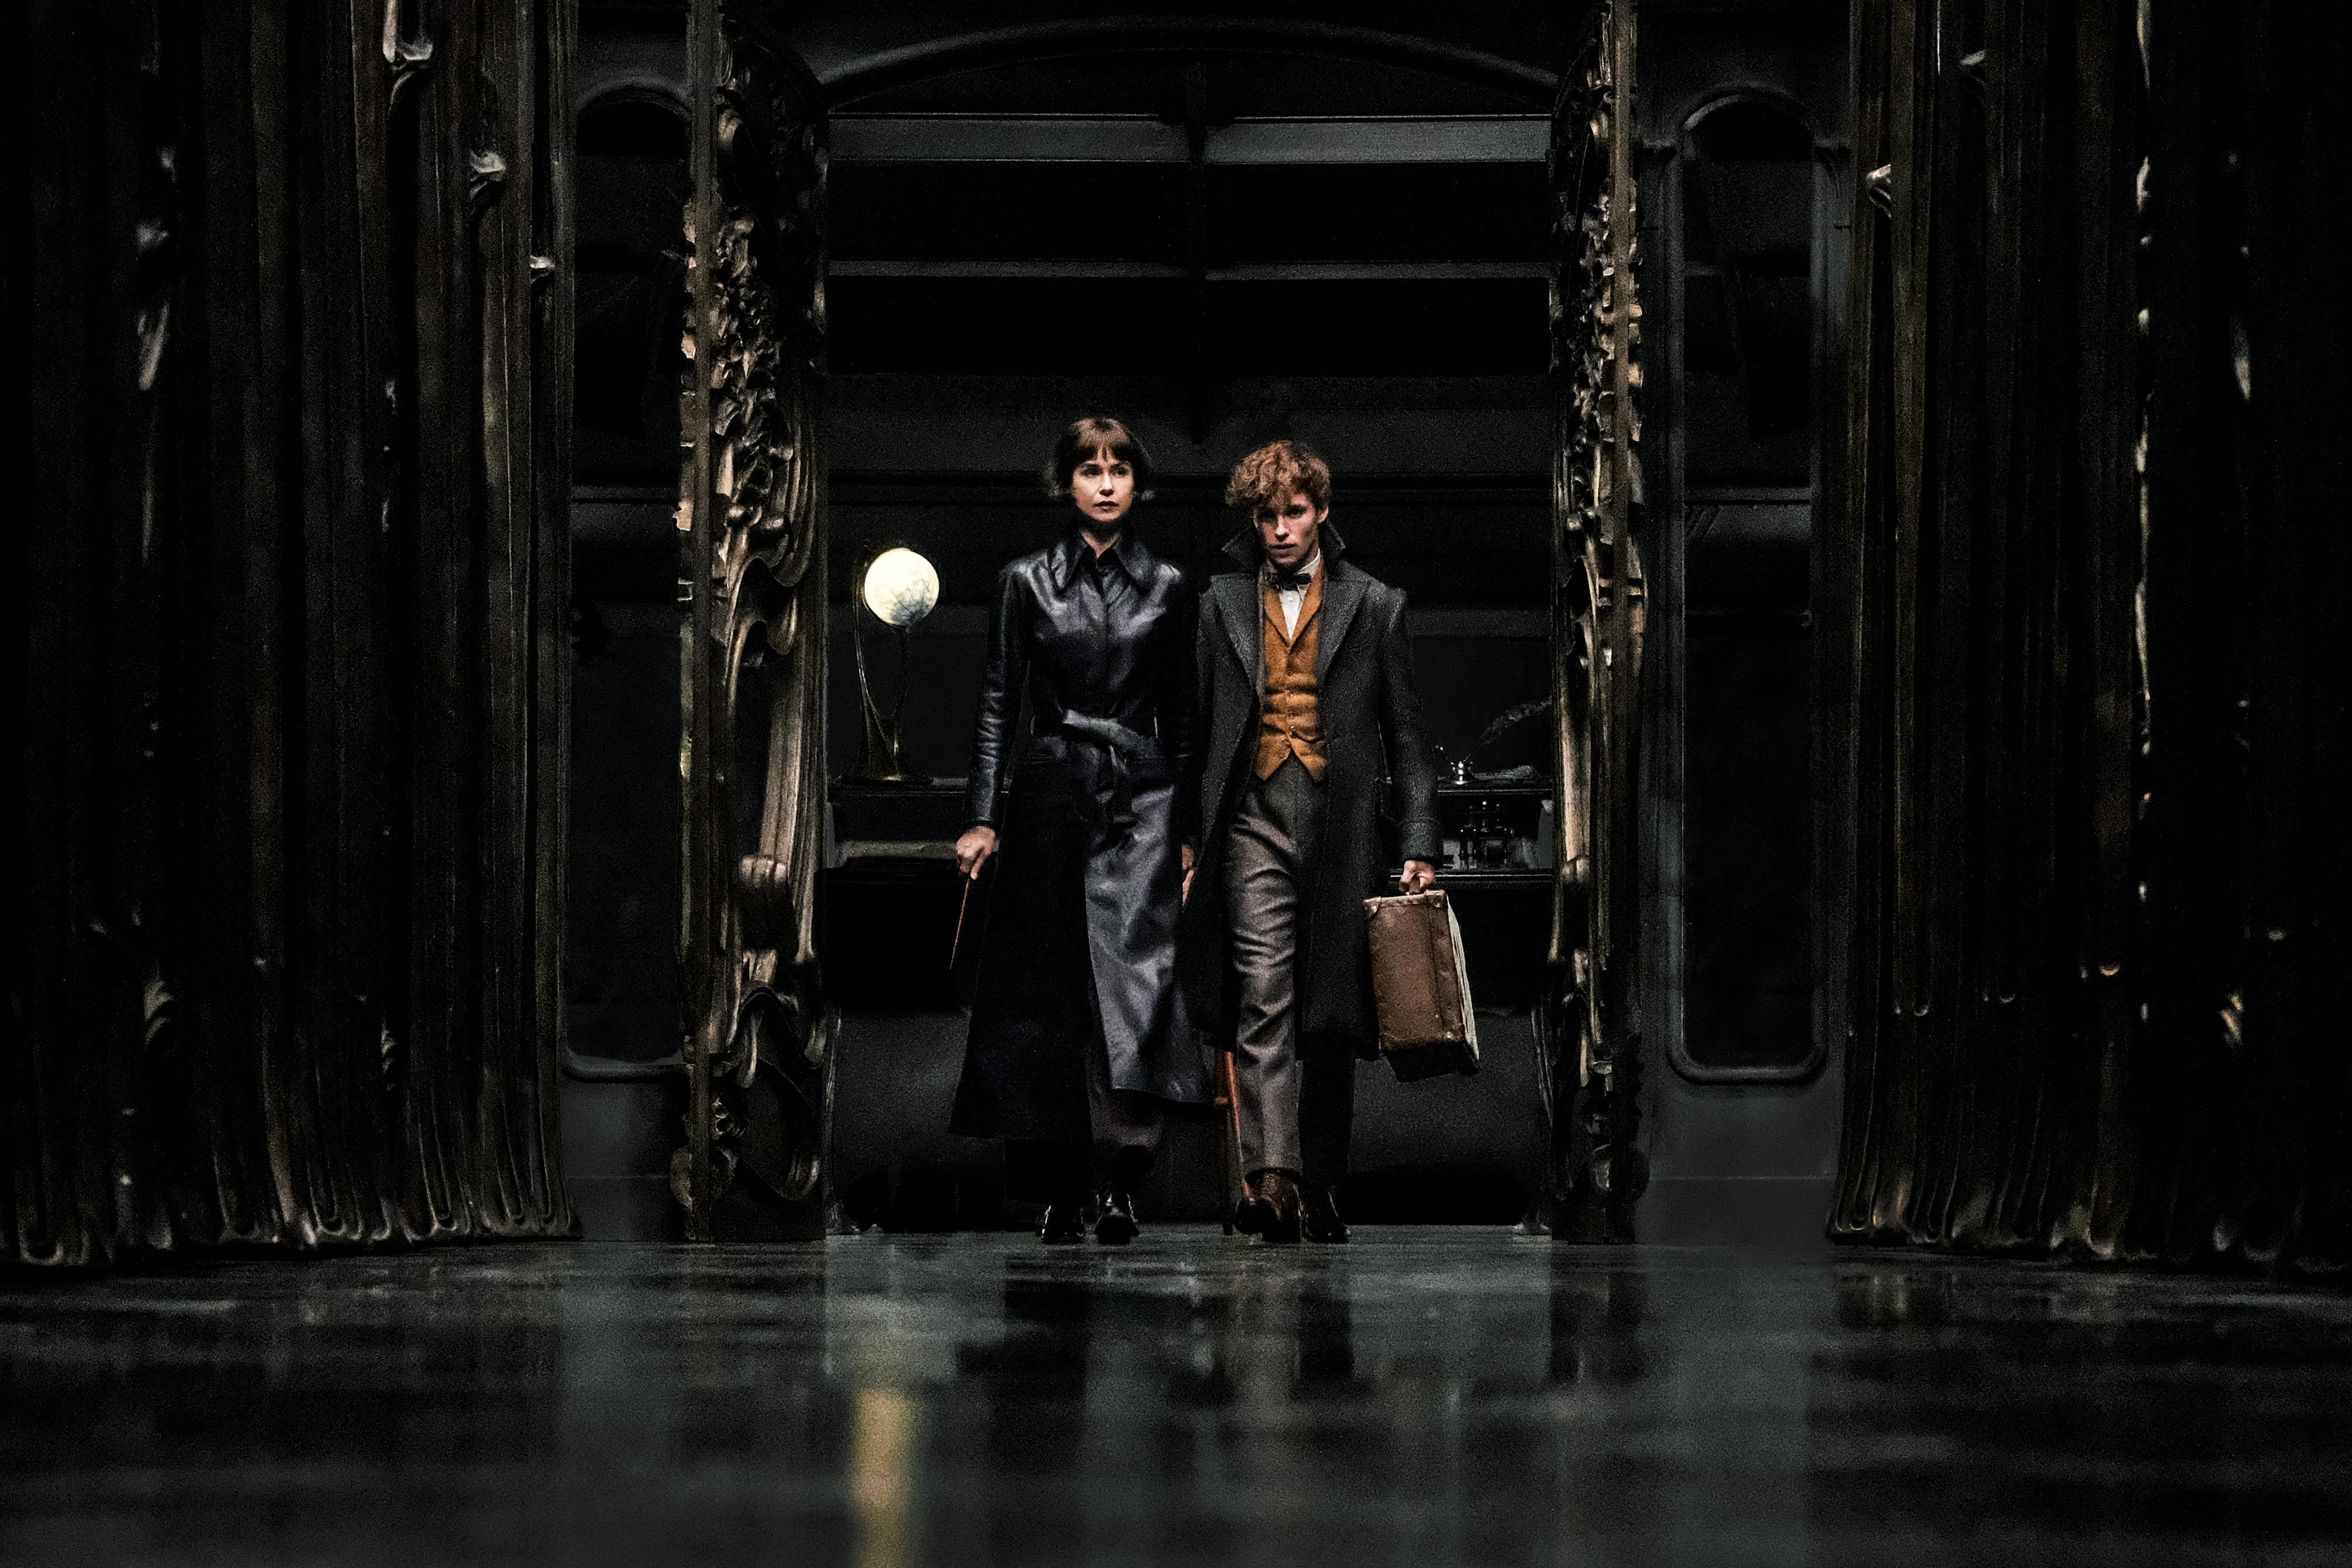 Tina Goldstein and Newt Scamander walk down a hallway.